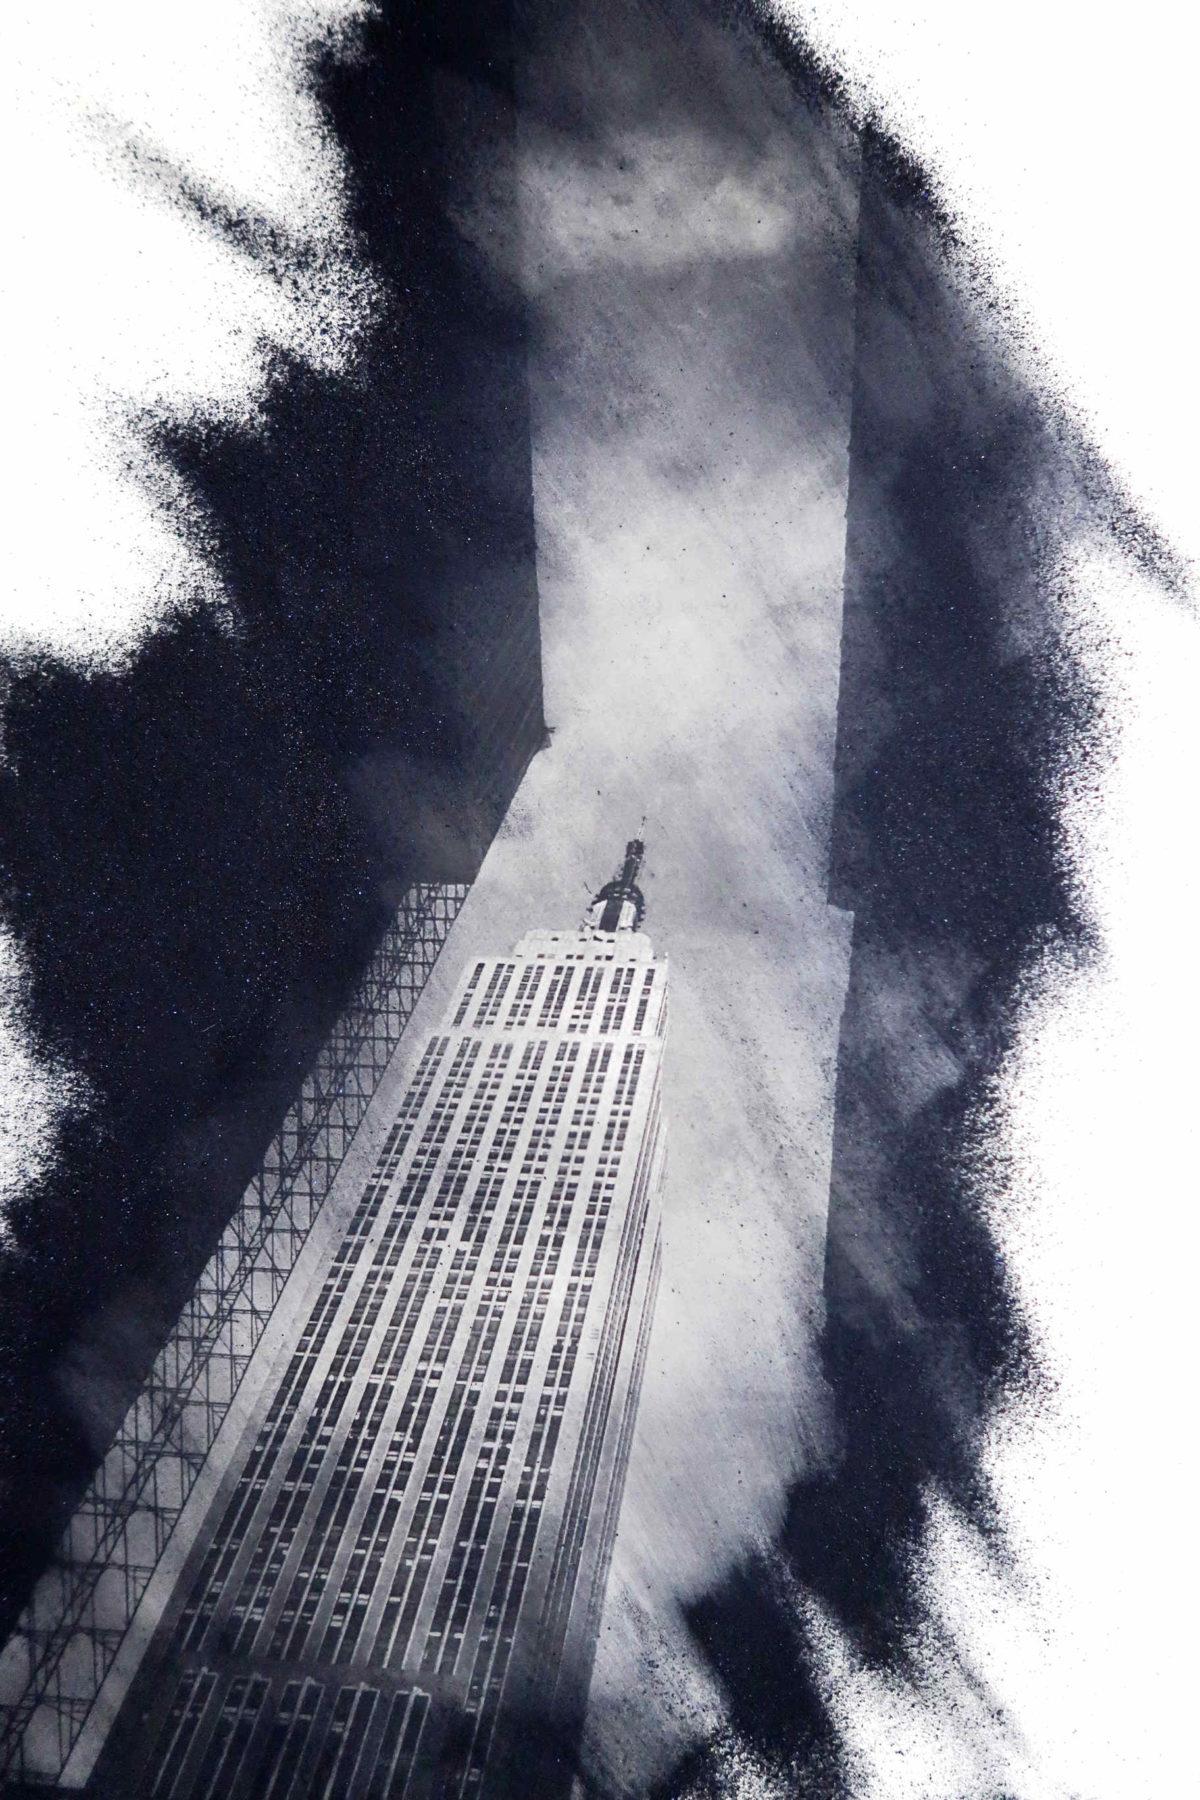 Art photo New York. Empire state building. Performance fotografica di stampa manuale